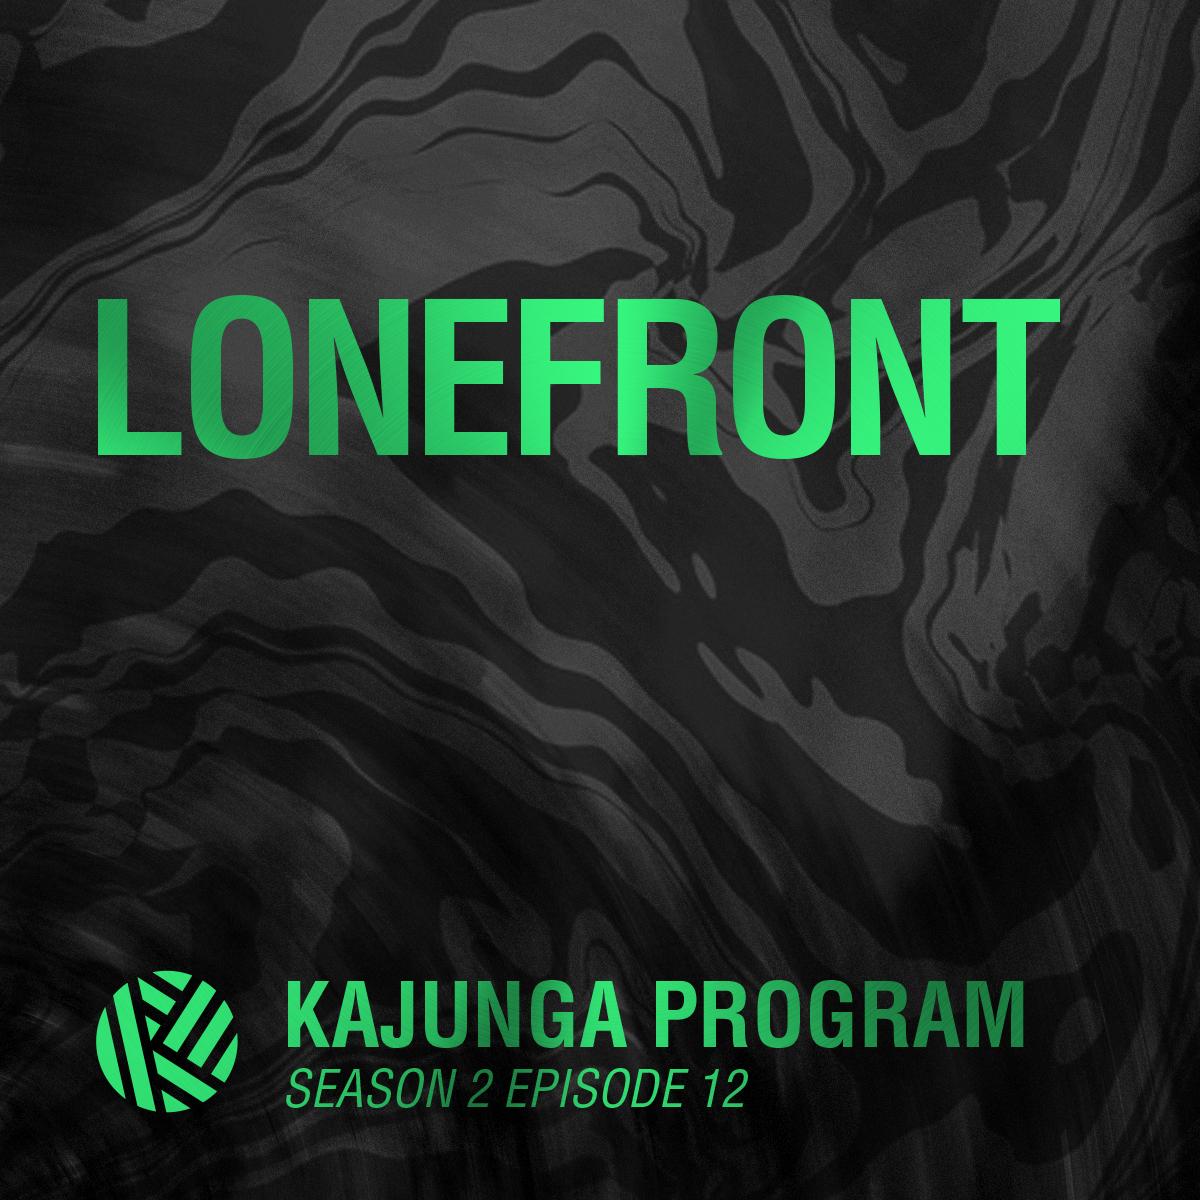 Kajunga_Program_Layout_Lonefront.jpg